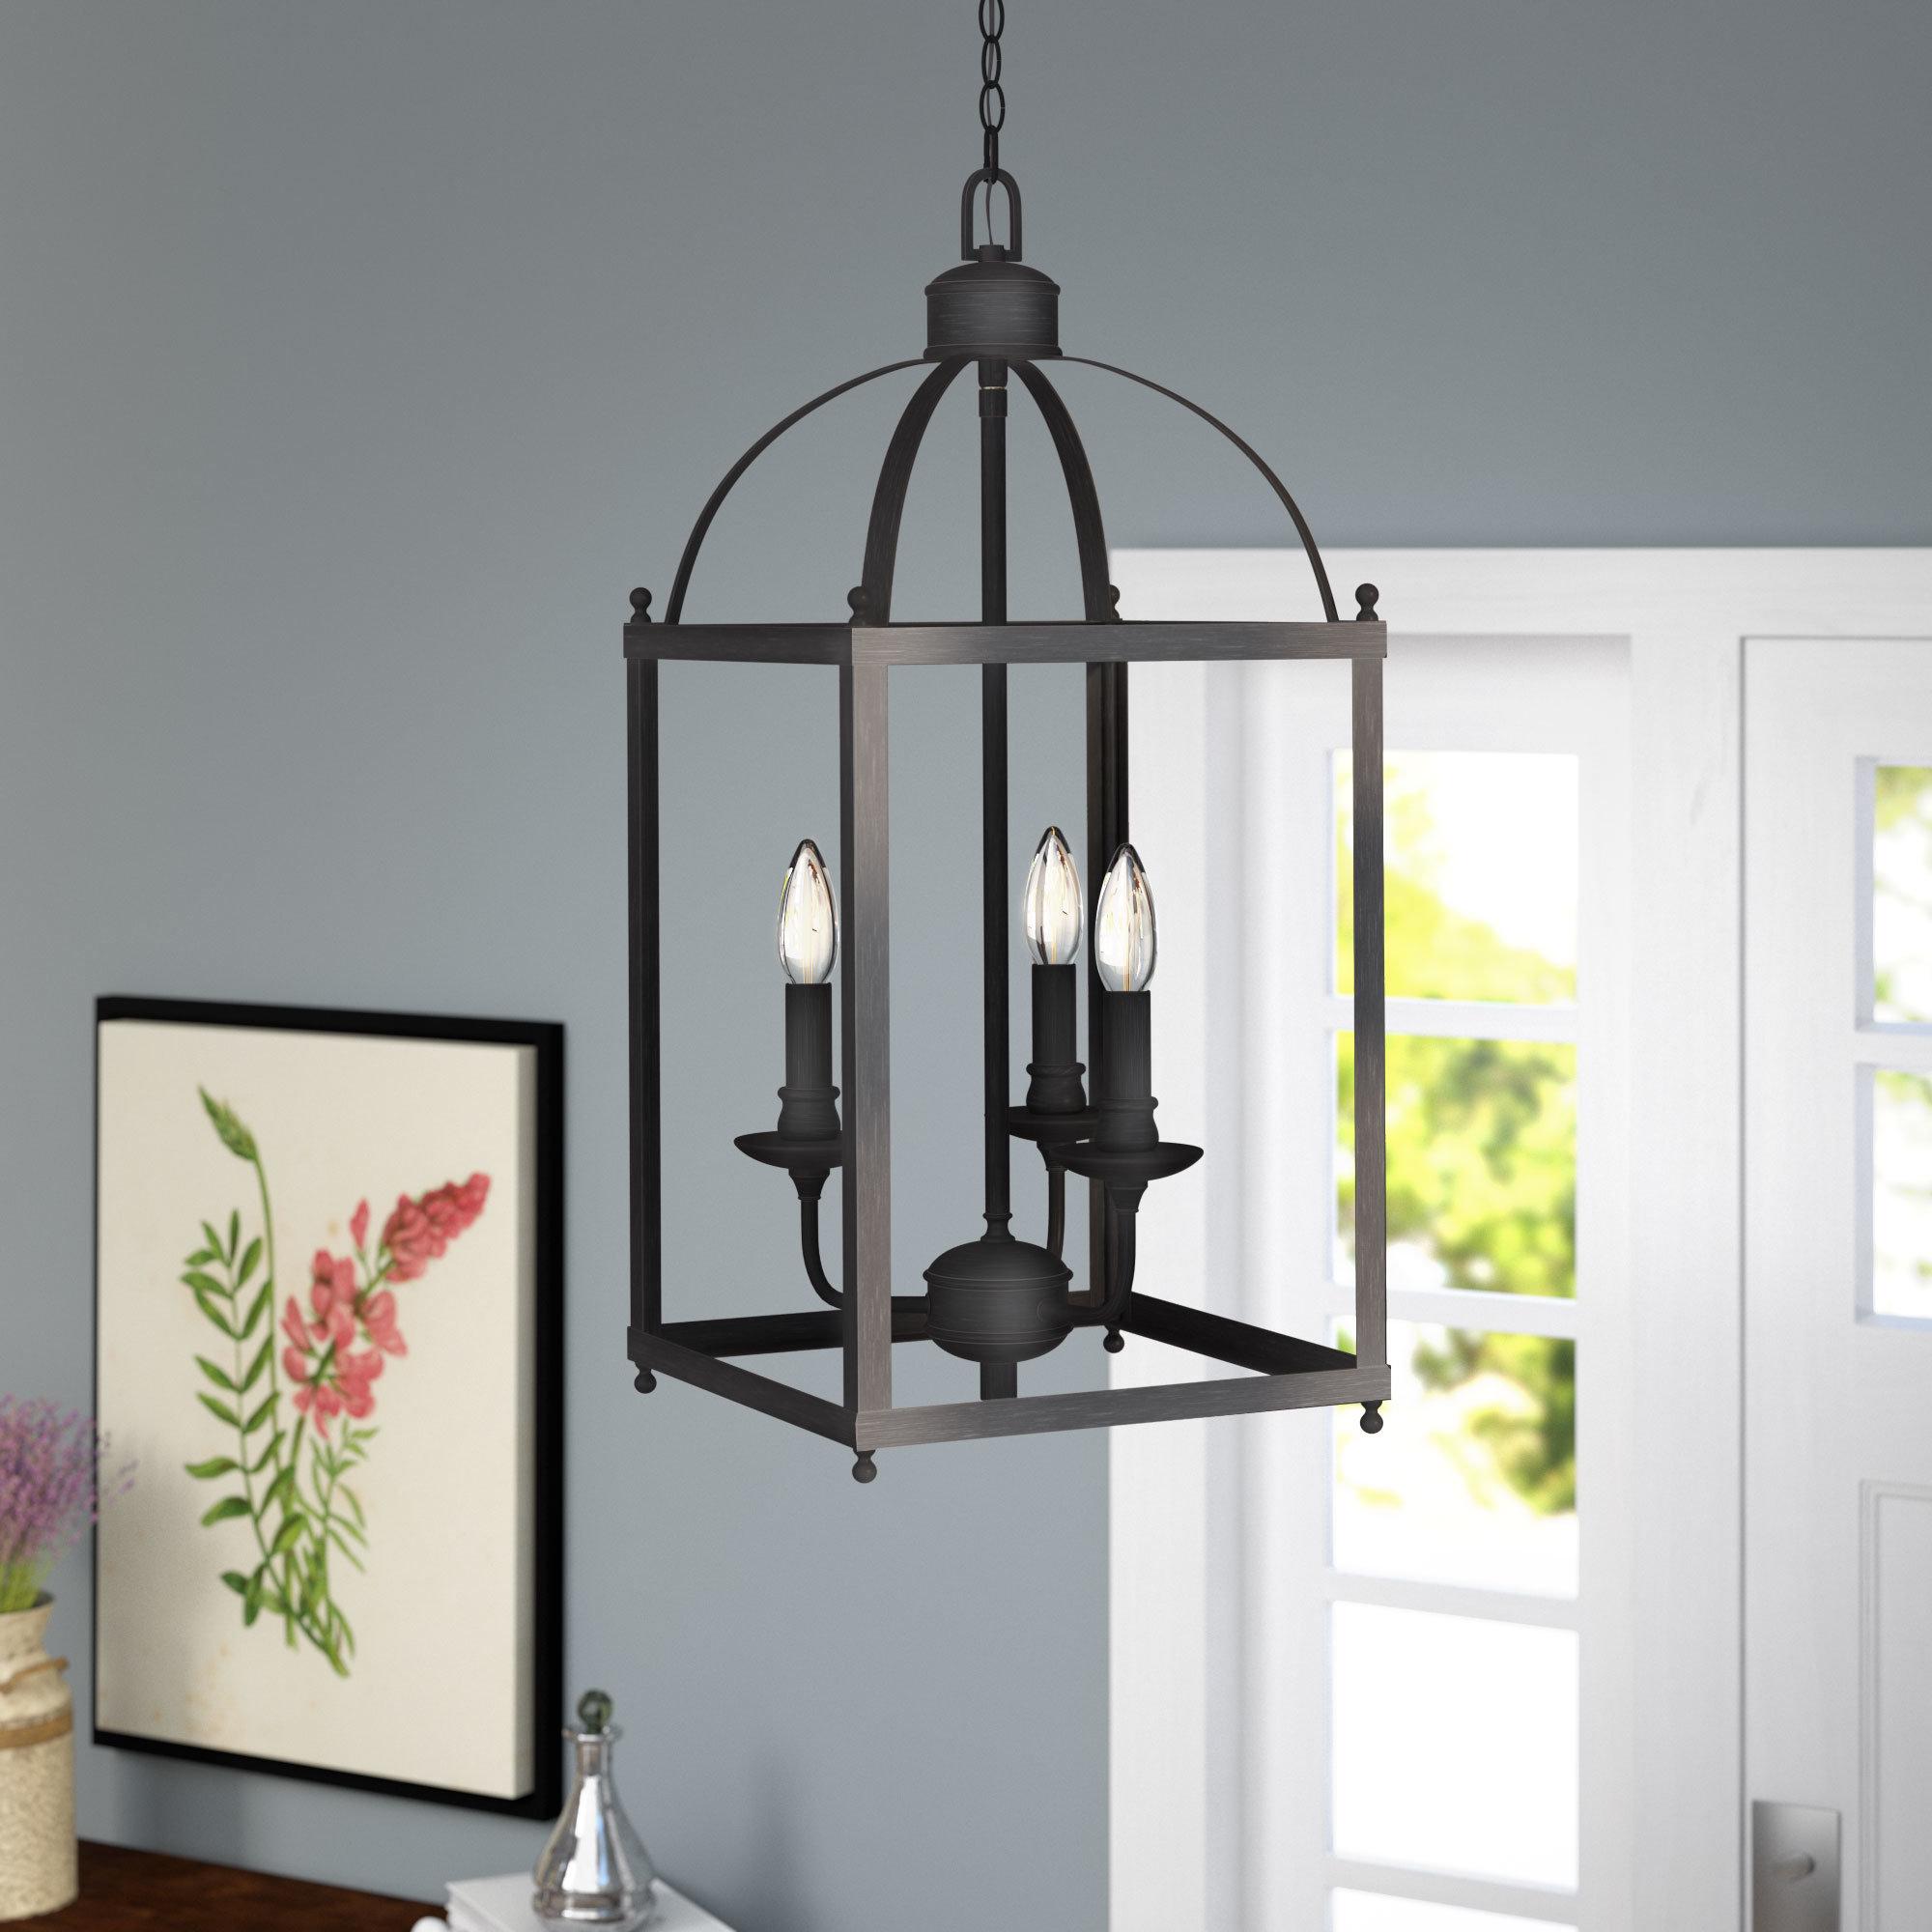 Leiters 3 Light Lantern Geometric Pendants Intended For Fashionable Cleona Modern 3 Light Foyer Pendant (View 13 of 25)